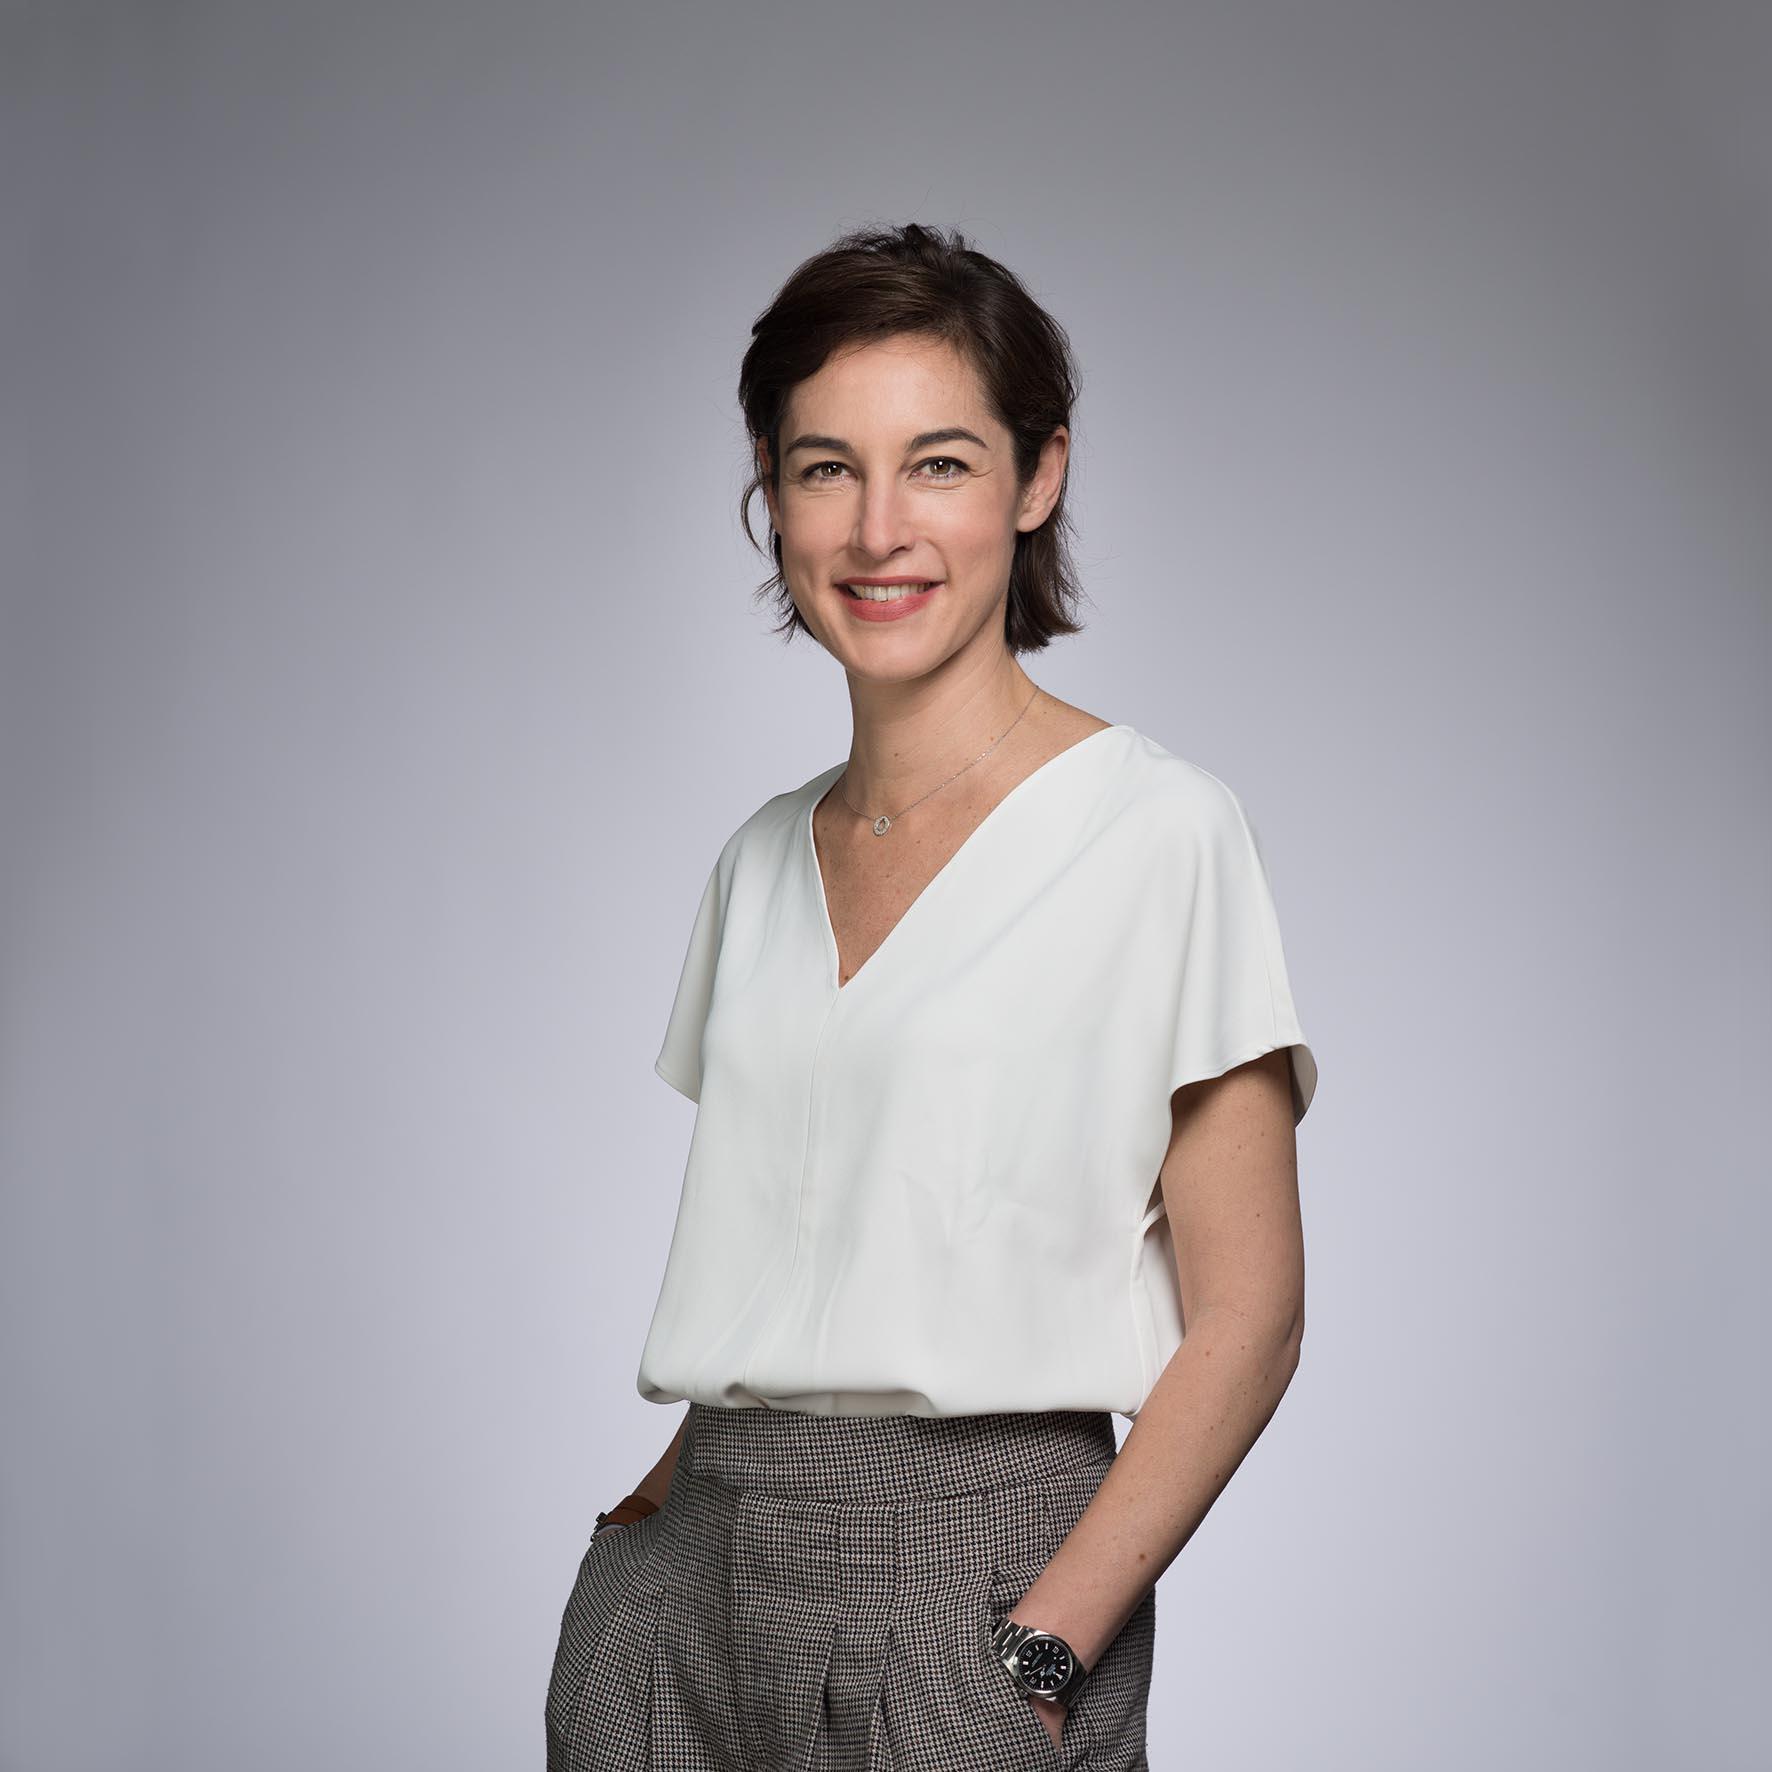 Julia Lefebvre